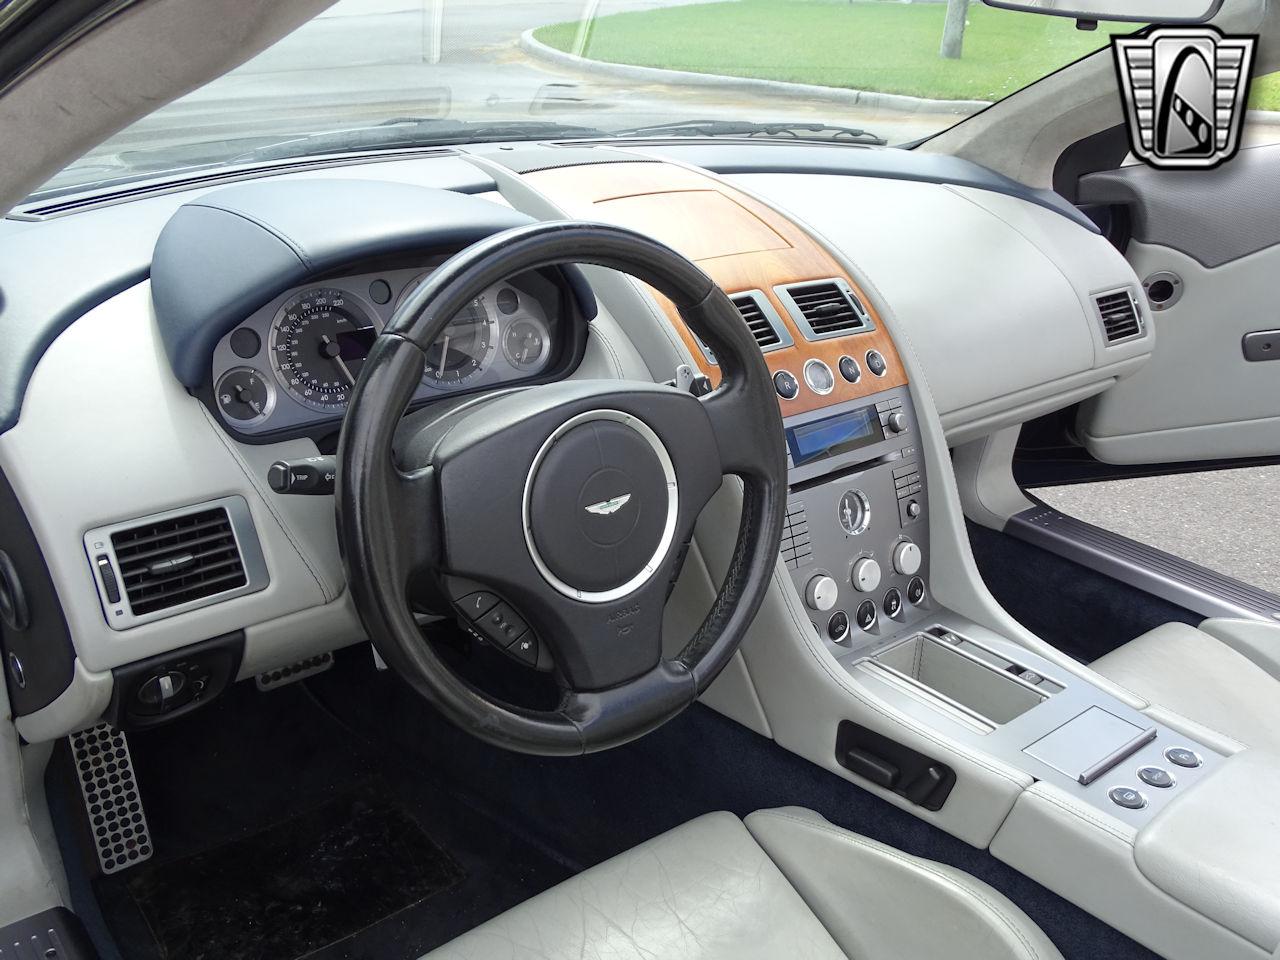 2006 Aston Martin DB9 16